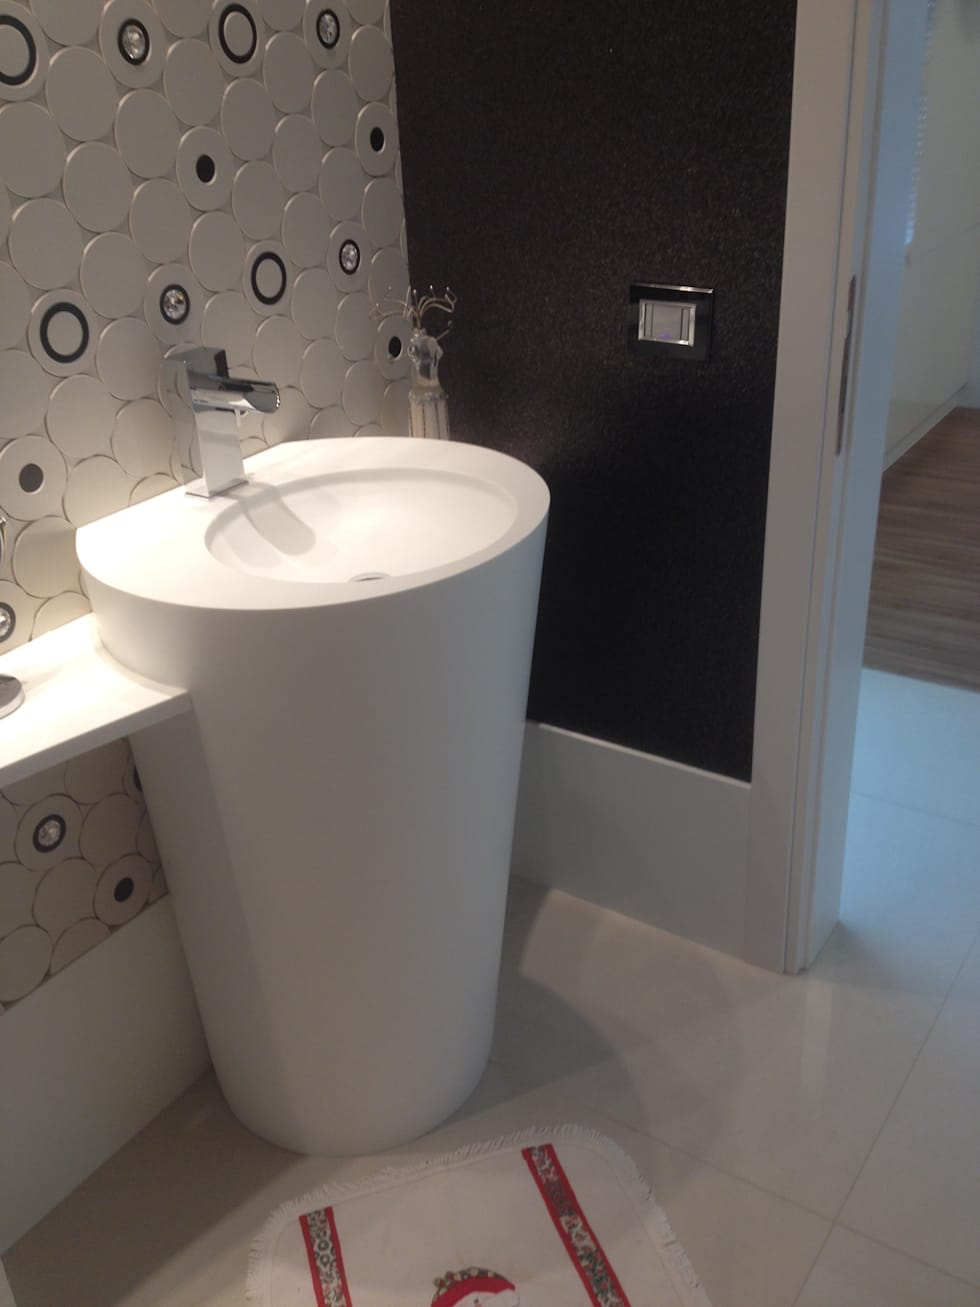 Lavabo: Banheiros modernos por Juliana Marodin